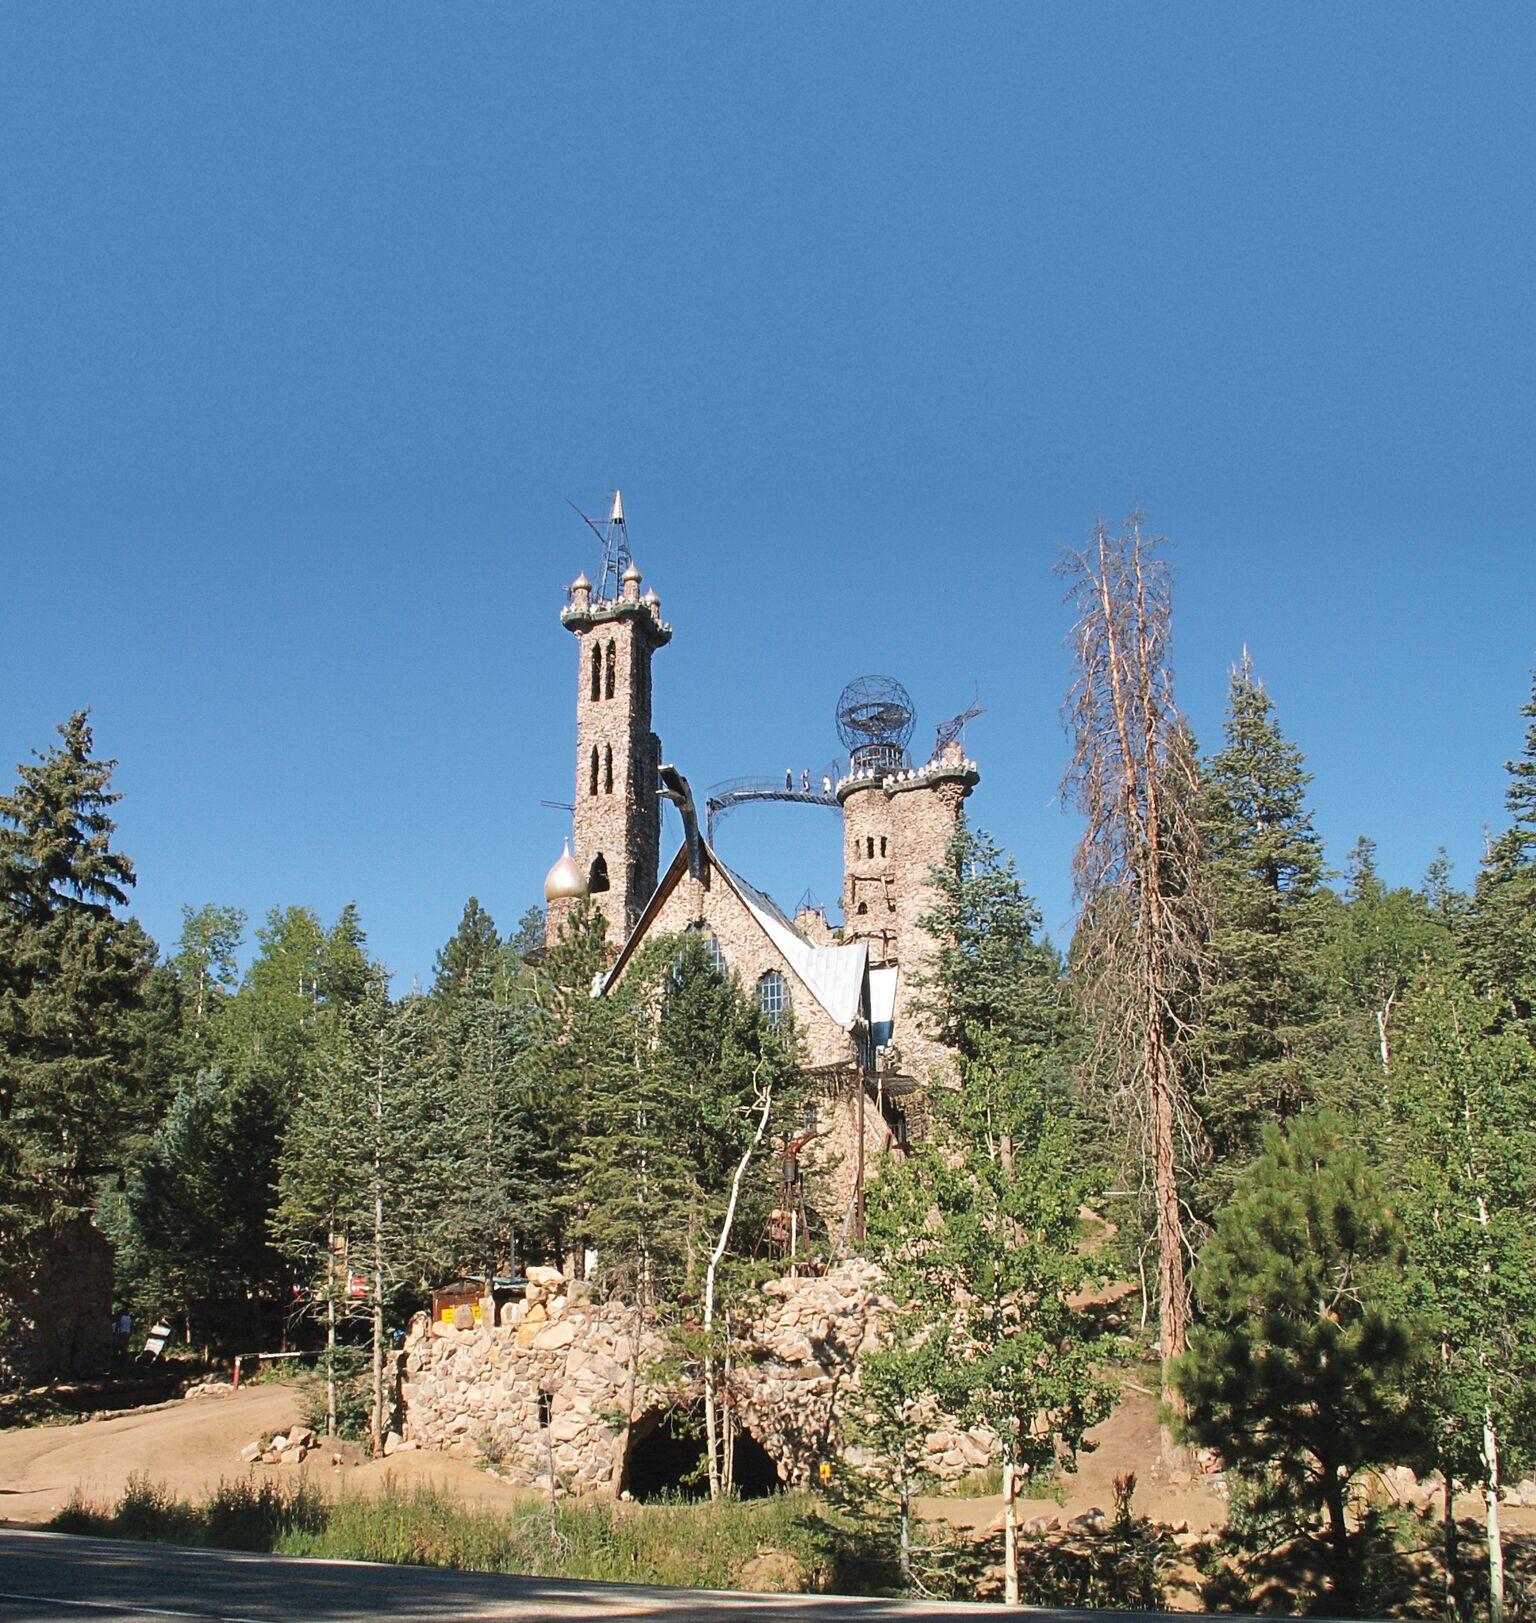 self-made castles